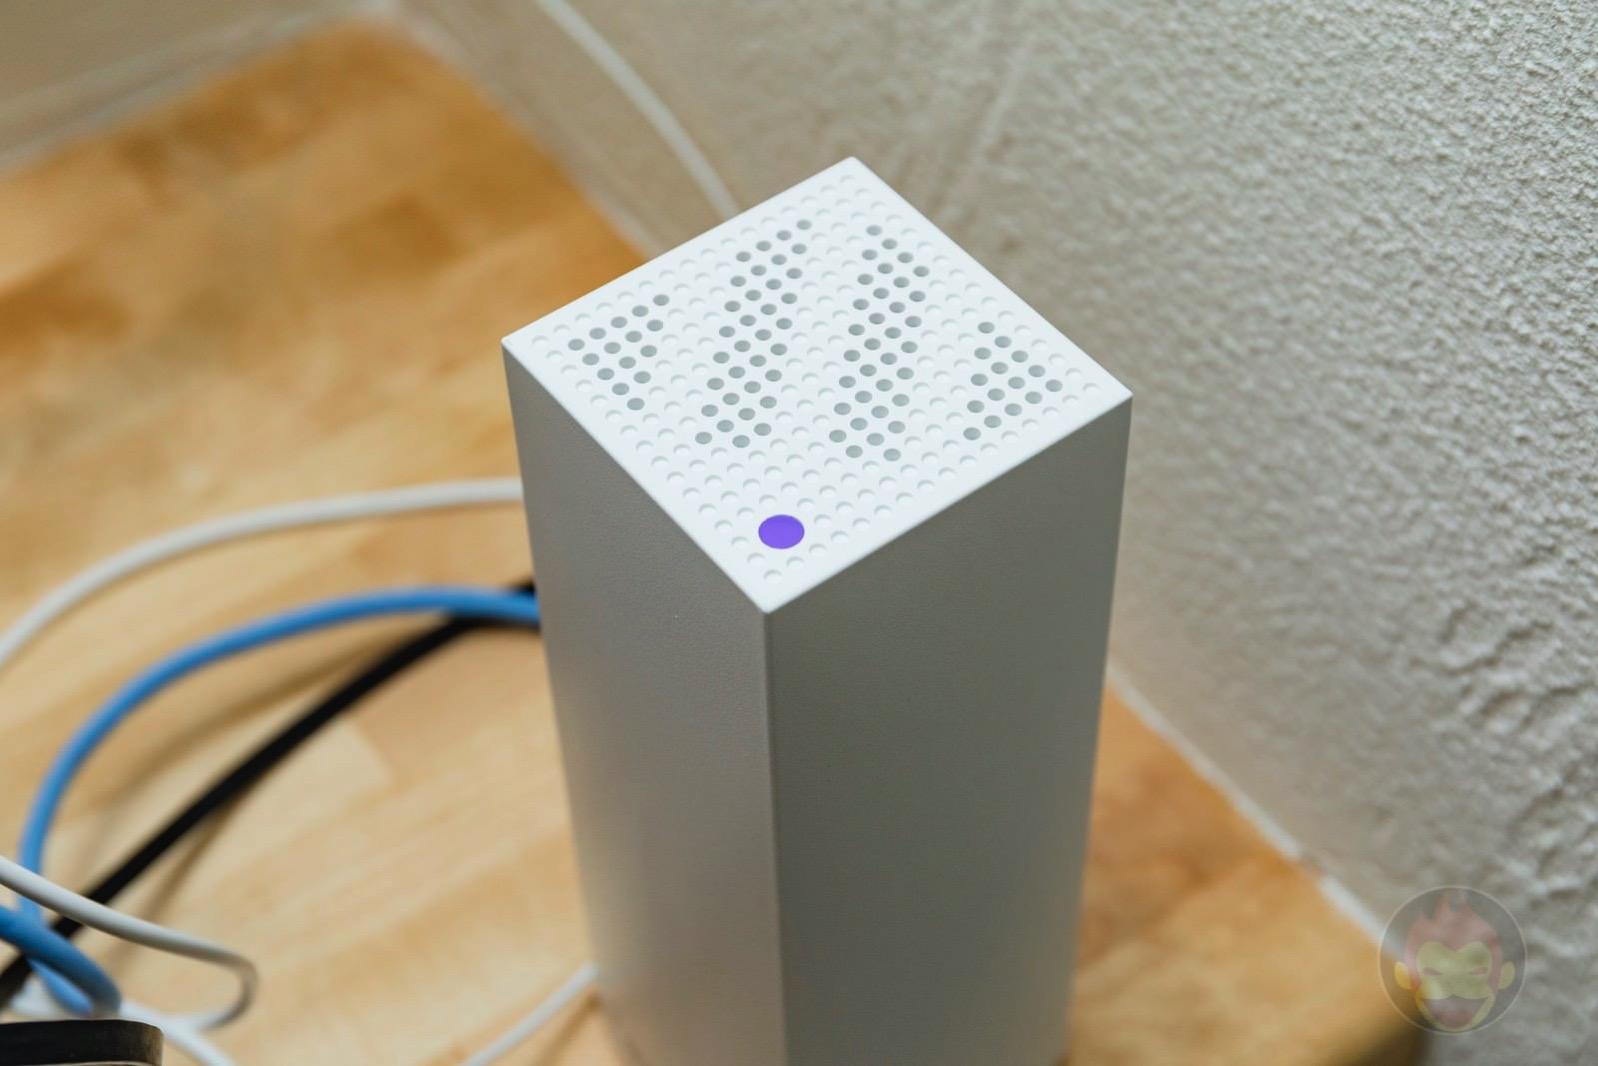 Linksys-Velop-WiFi-Router-07.jpg